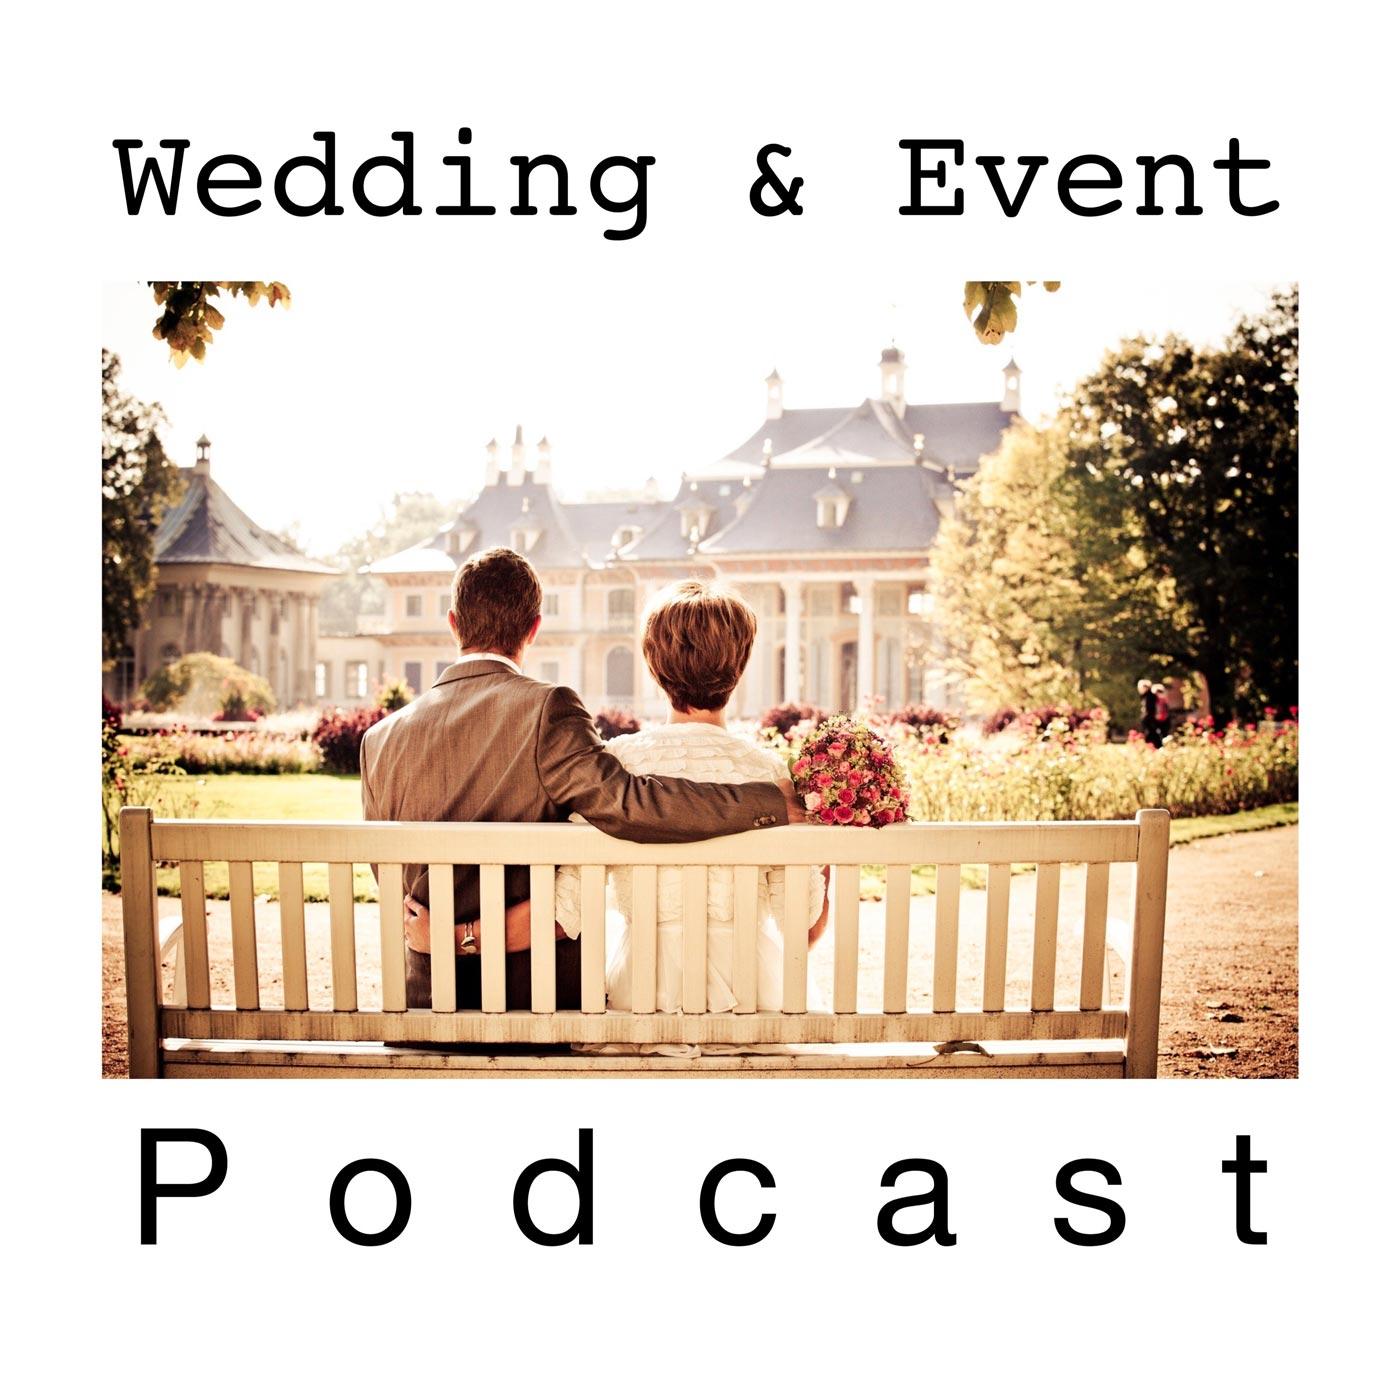 Wedding & Event Podcast